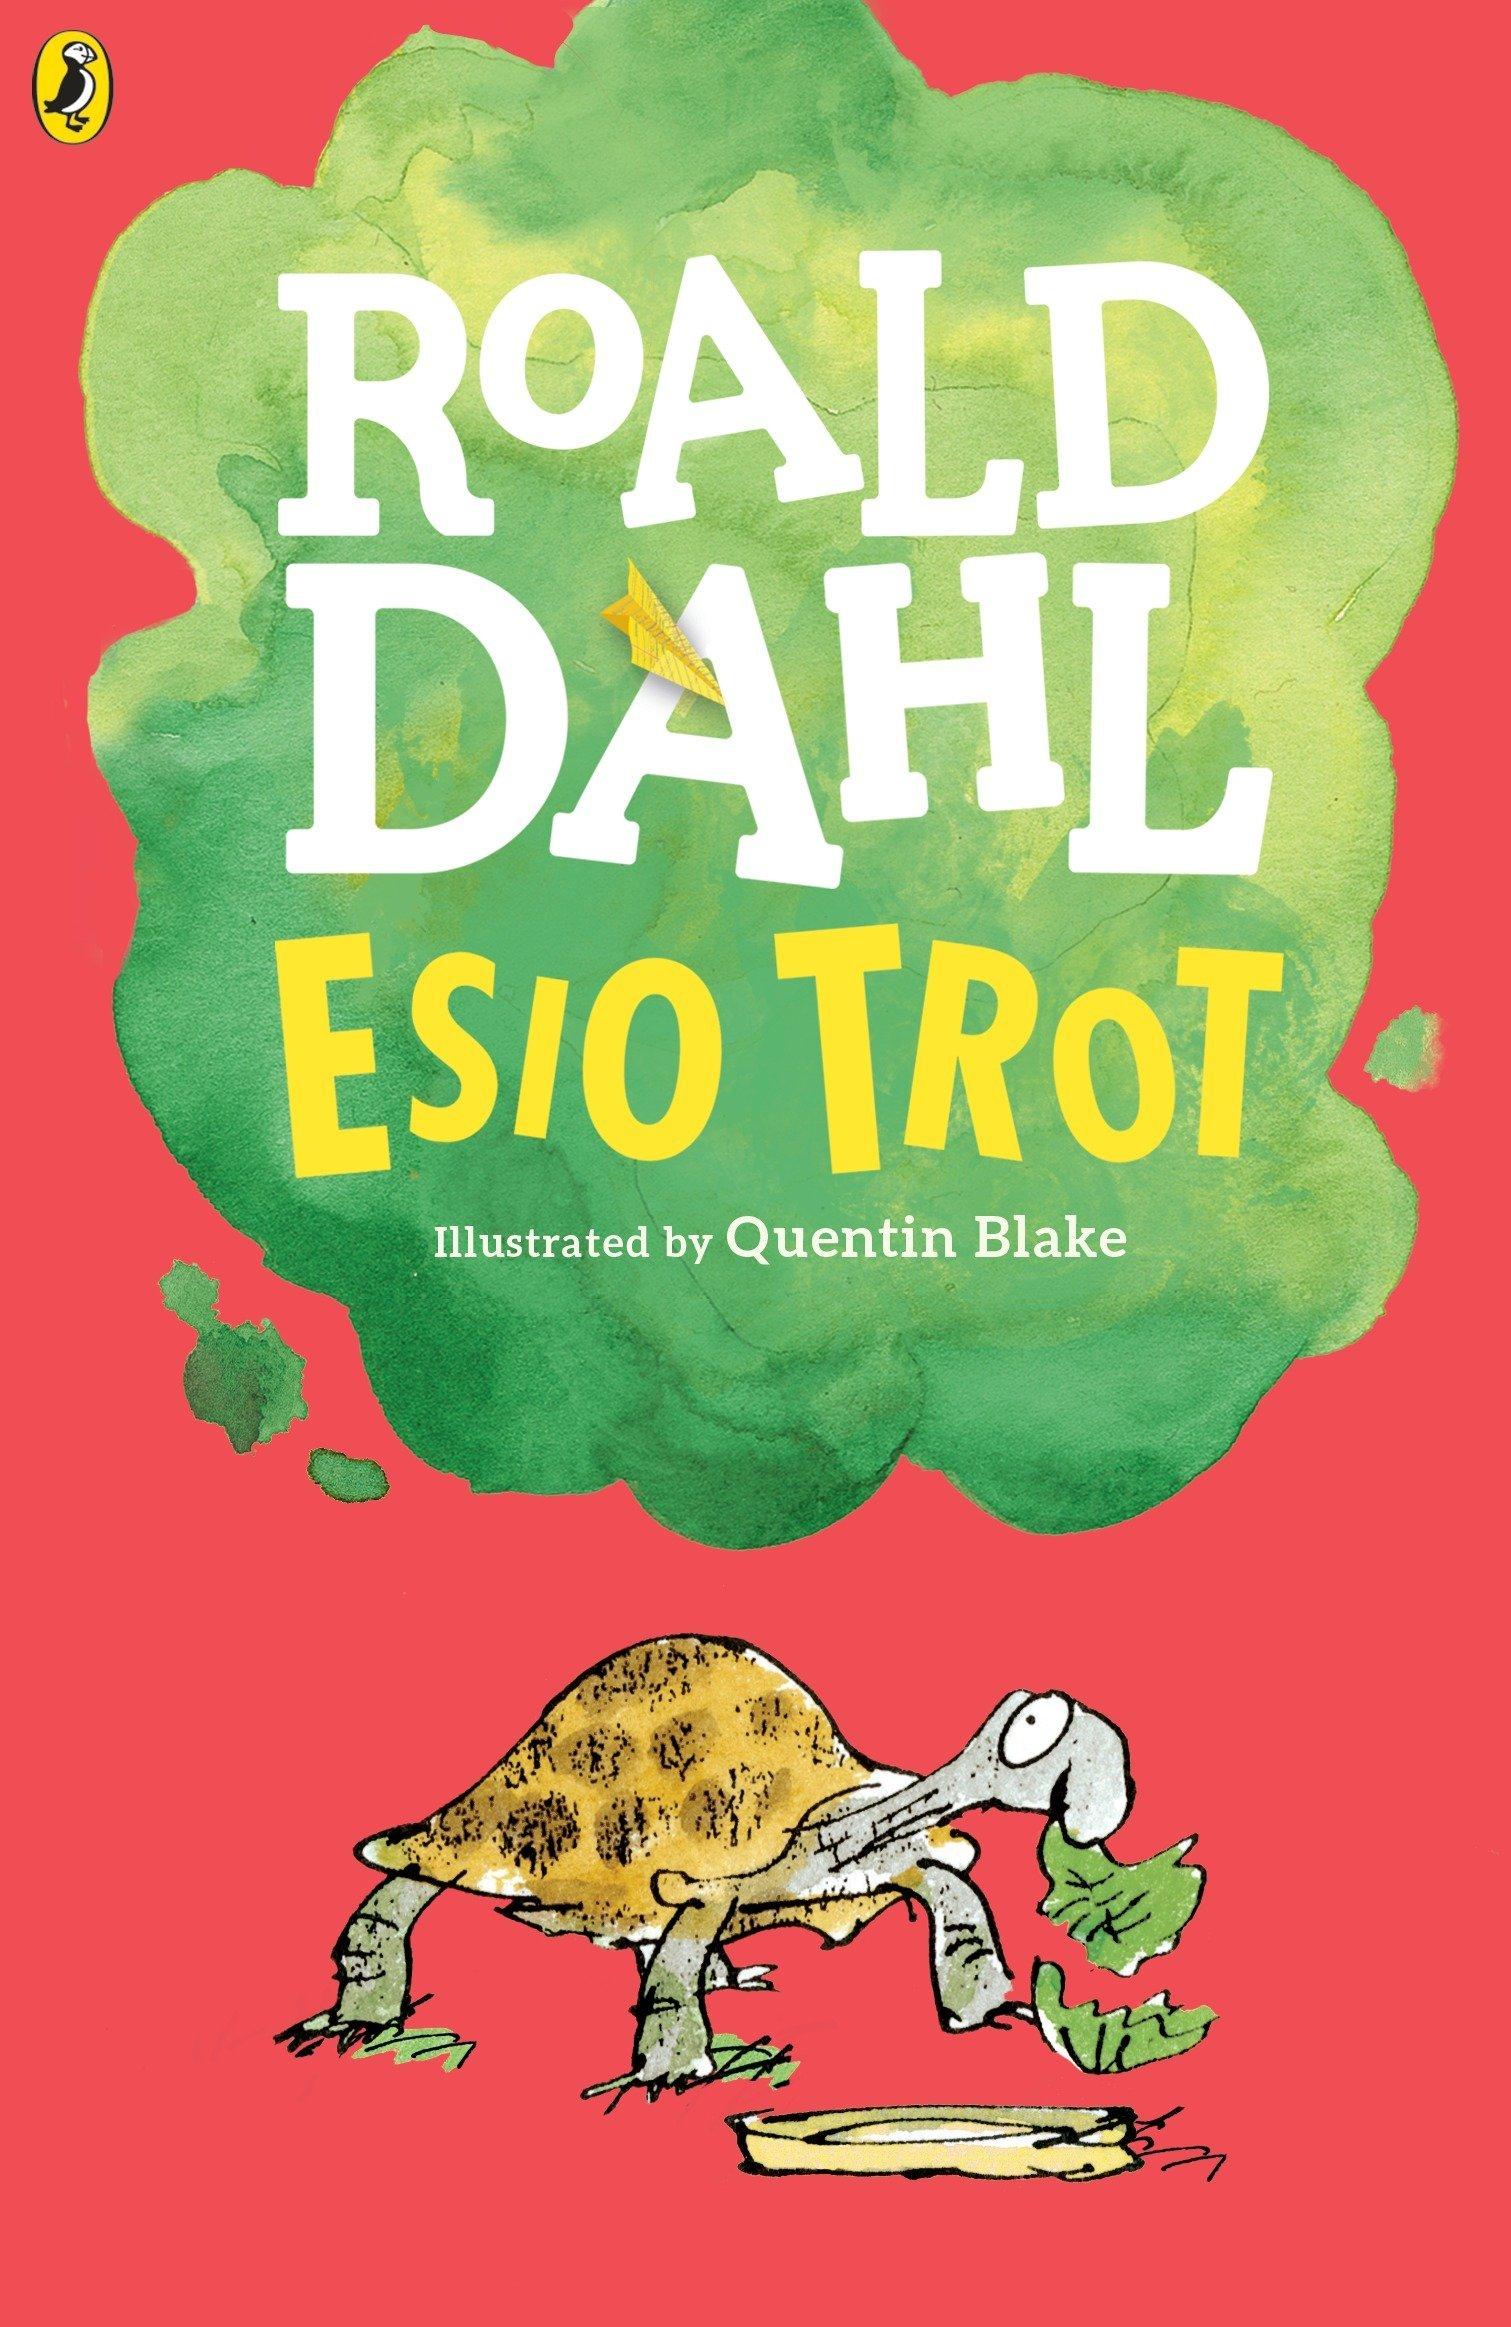 Esio Trot: Dahl, Roald, Blake, Quentin: 9780142413821: Amazon.com: Books